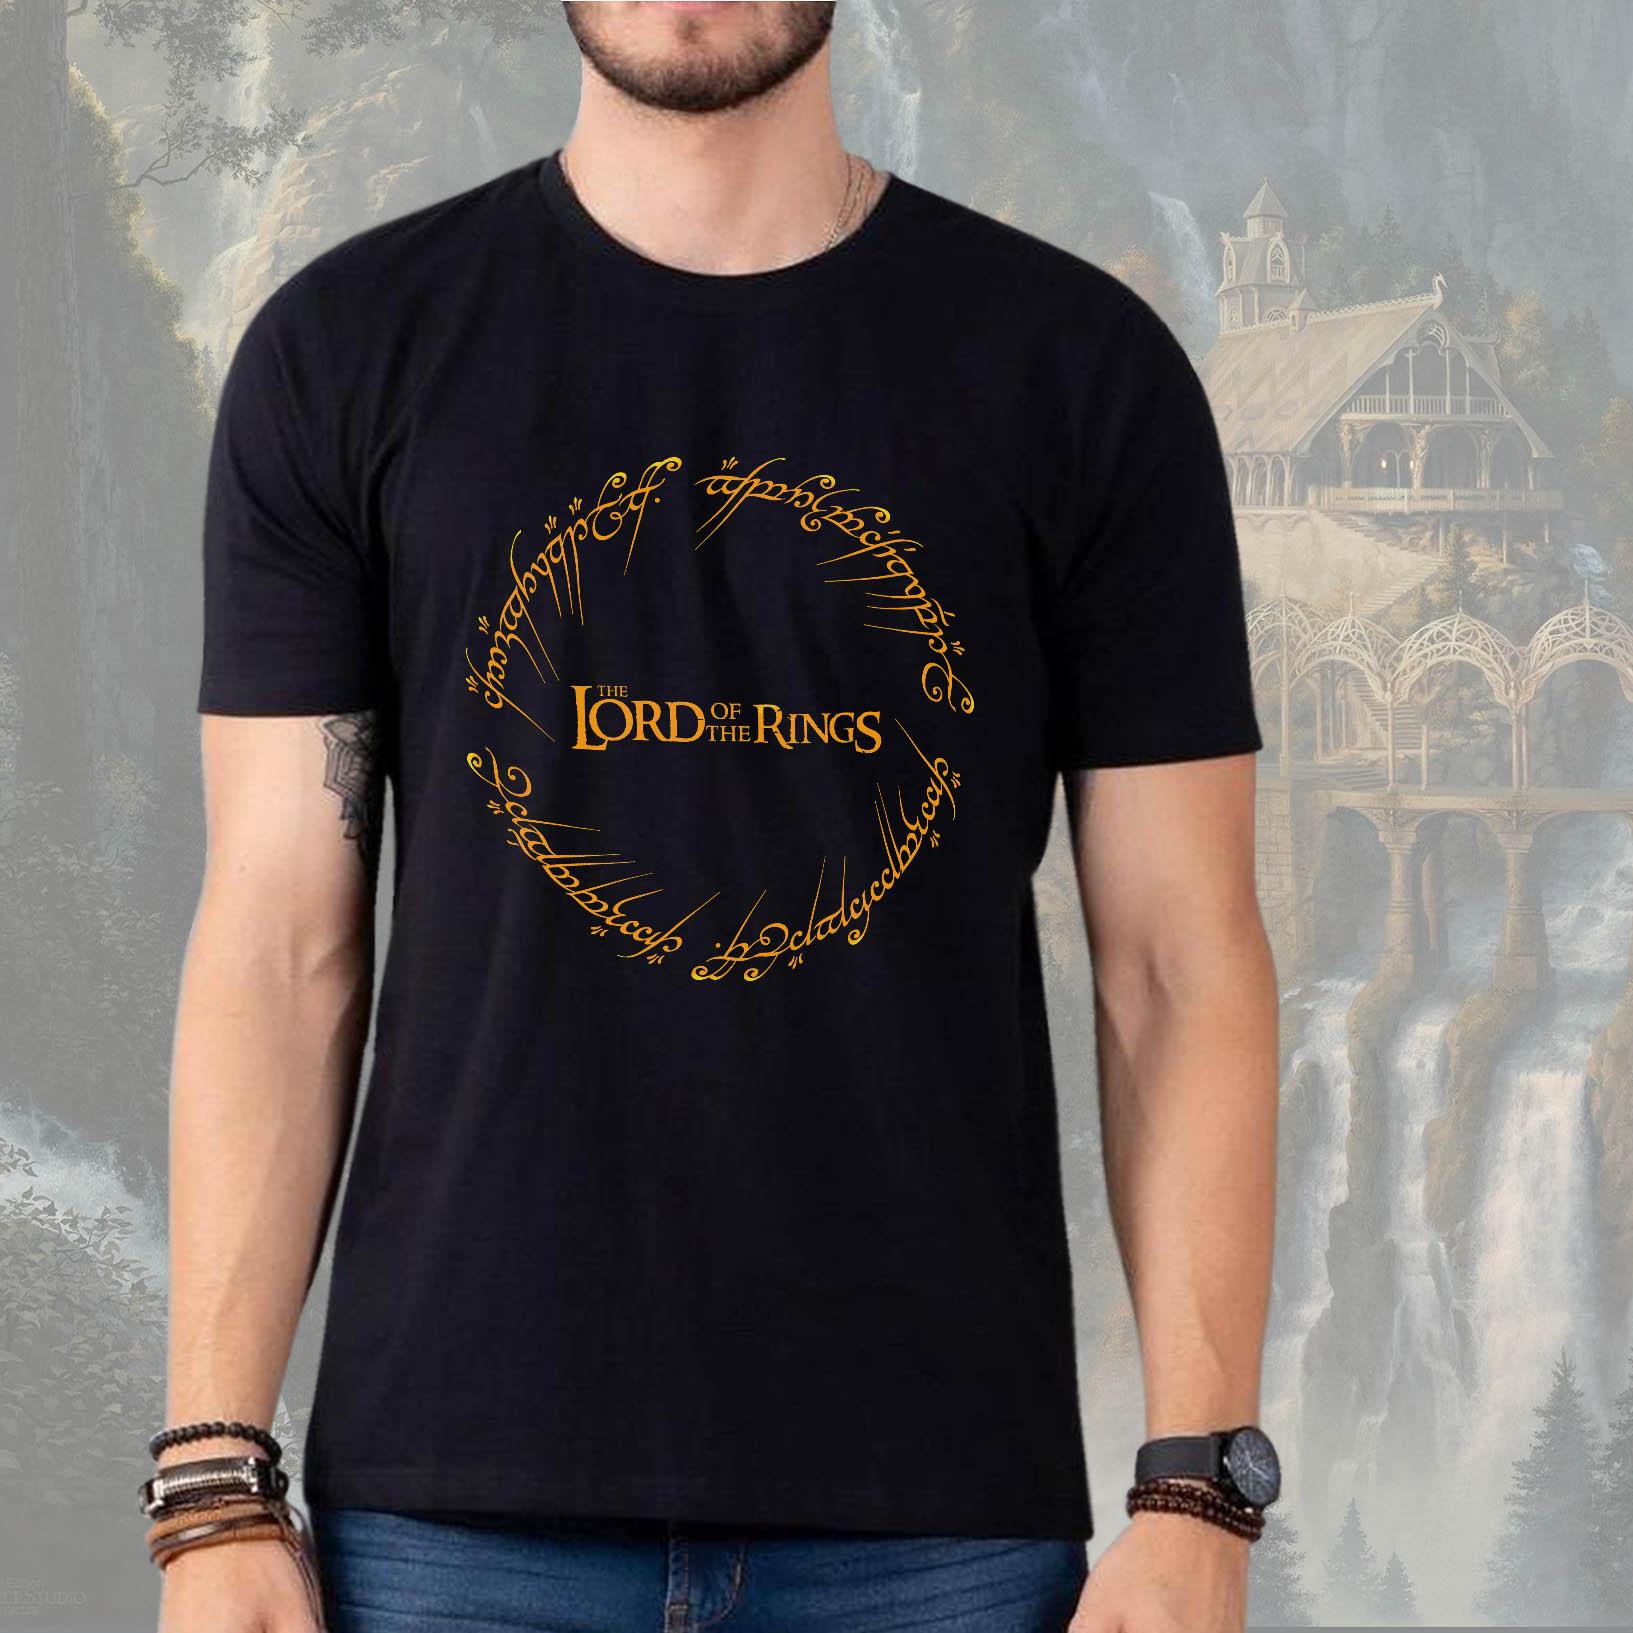 Camiseta Masculina Unissex Lord Of The Rings O Senhor Dos Anéis Anél De Sauron (Preta) - EV